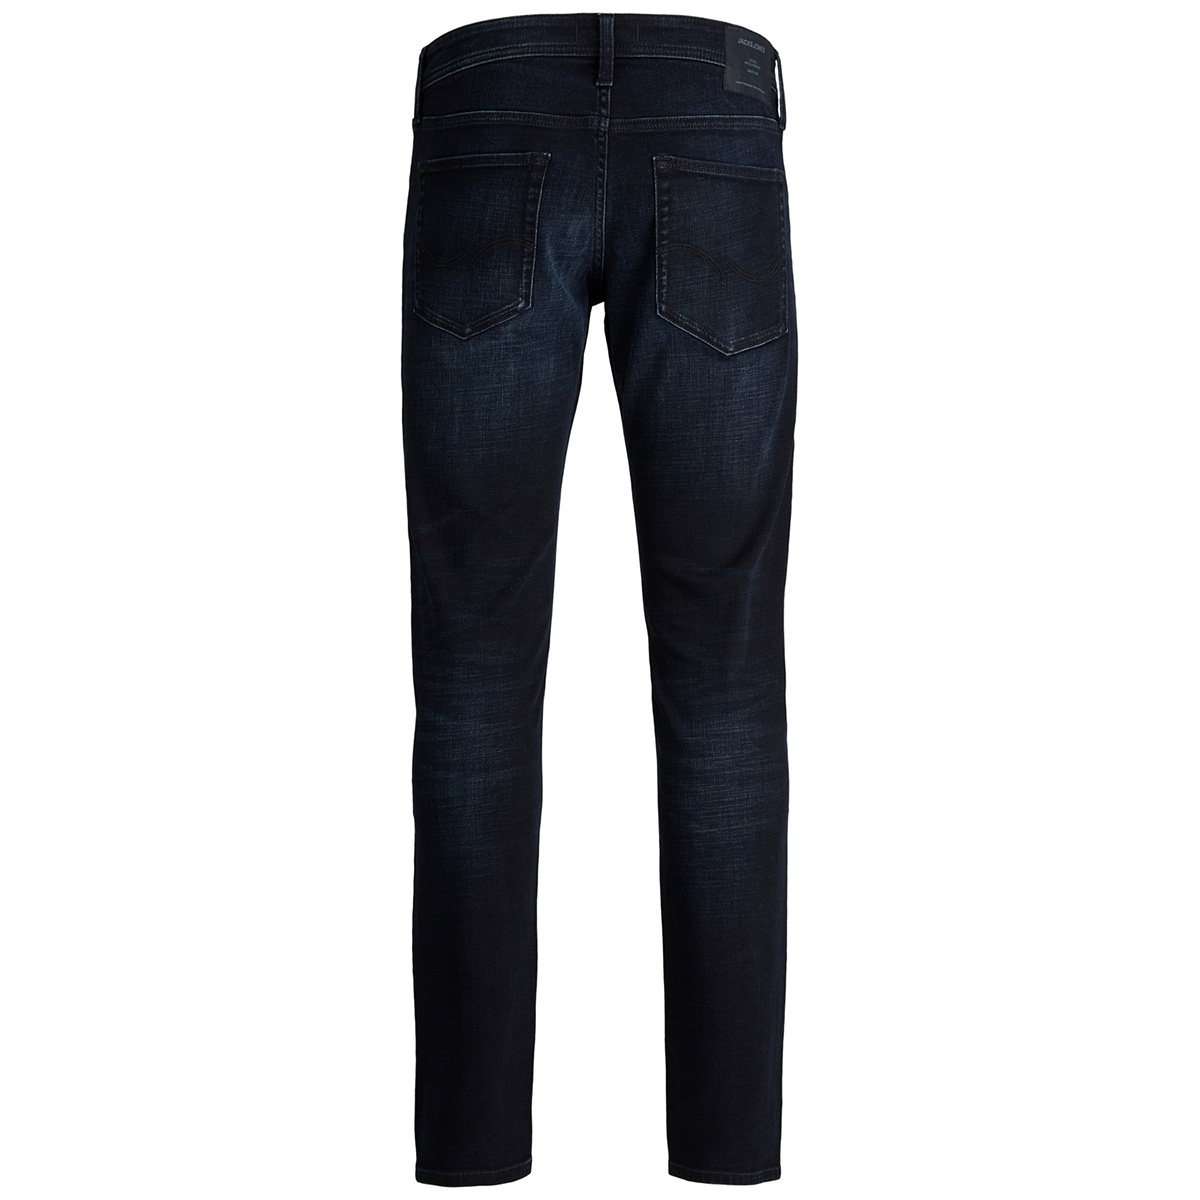 jjiglenn jjoriginal ge 341 50sps 12181857 jack & jones jeans blue denim